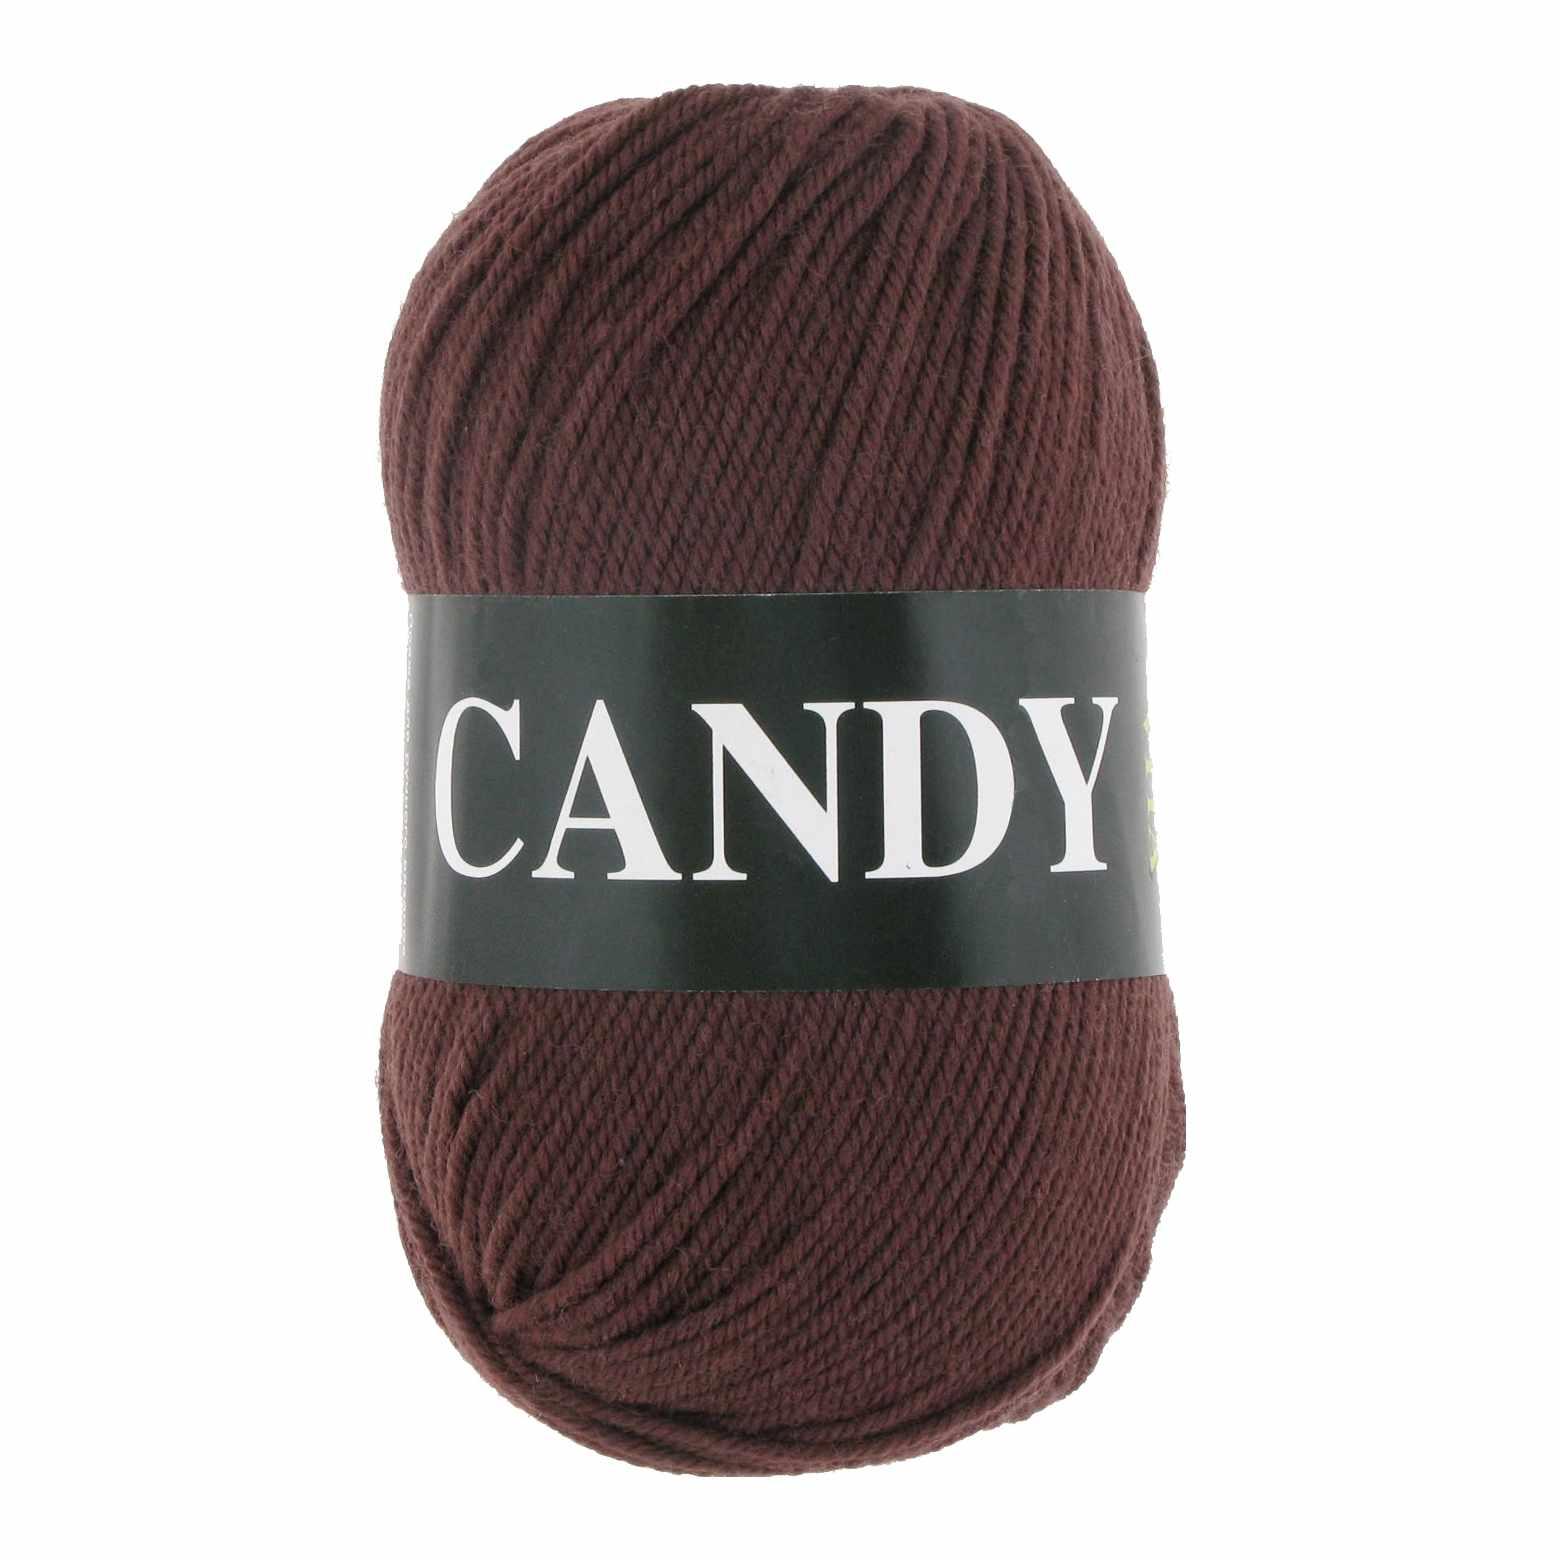 Пряжа VITA Candy Цвет.2535 Темно молочный шоколад